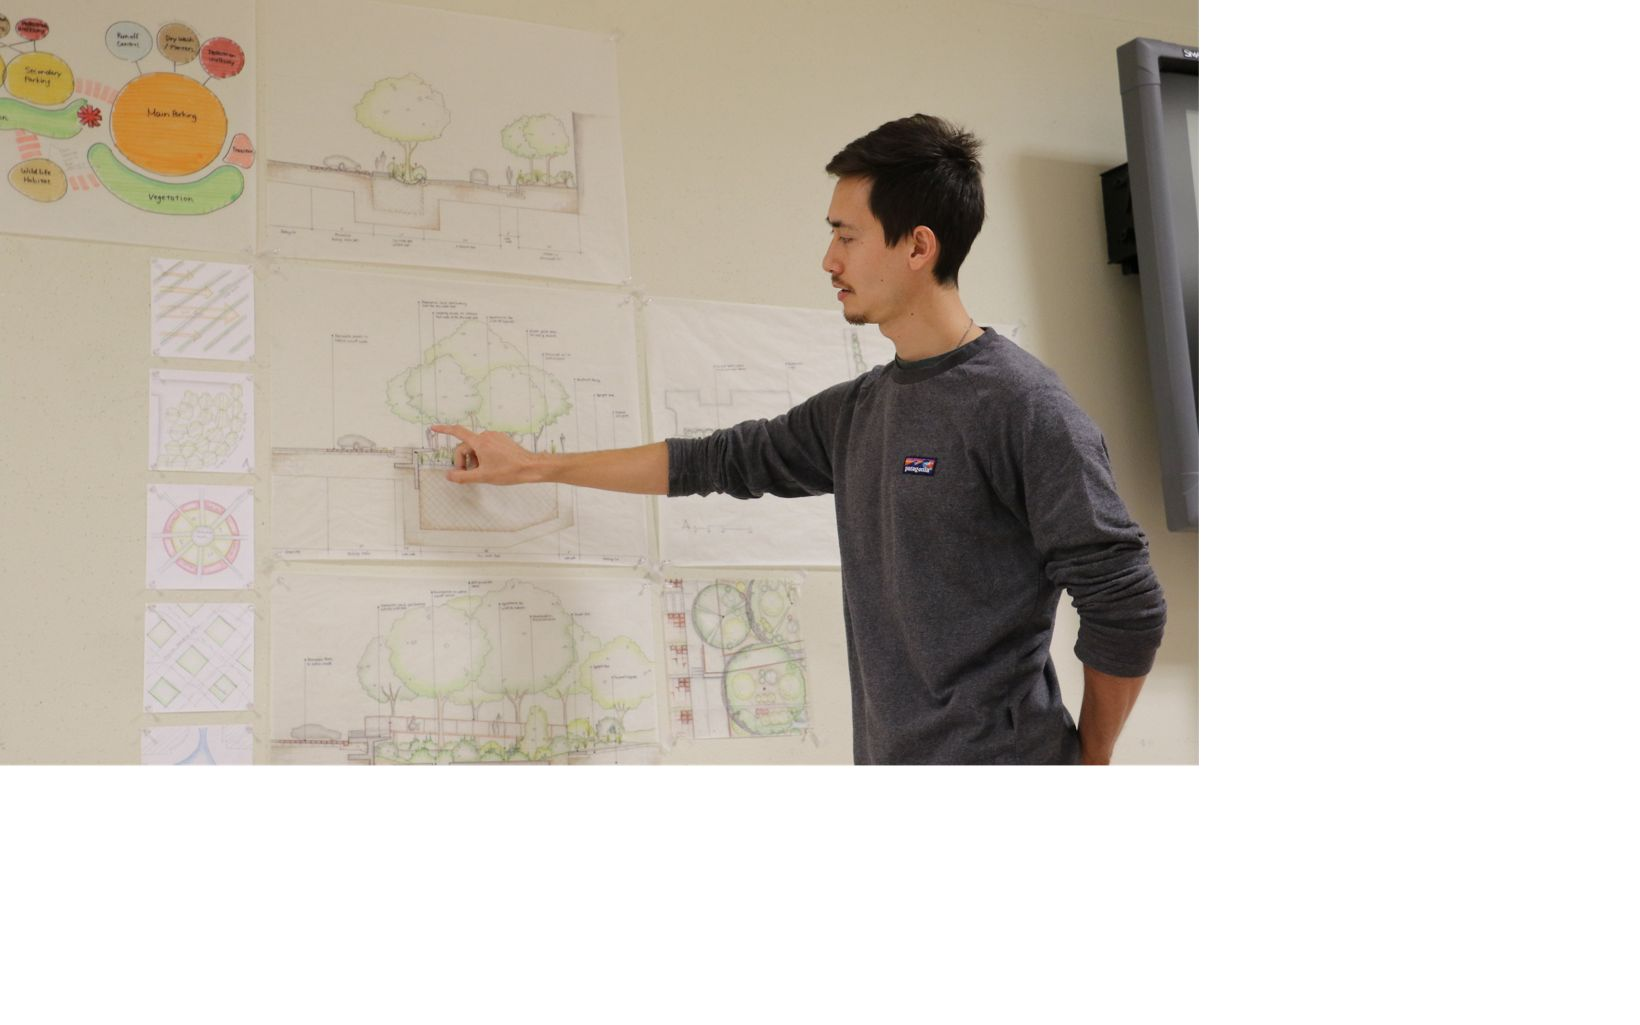 UNLV Class Presentation